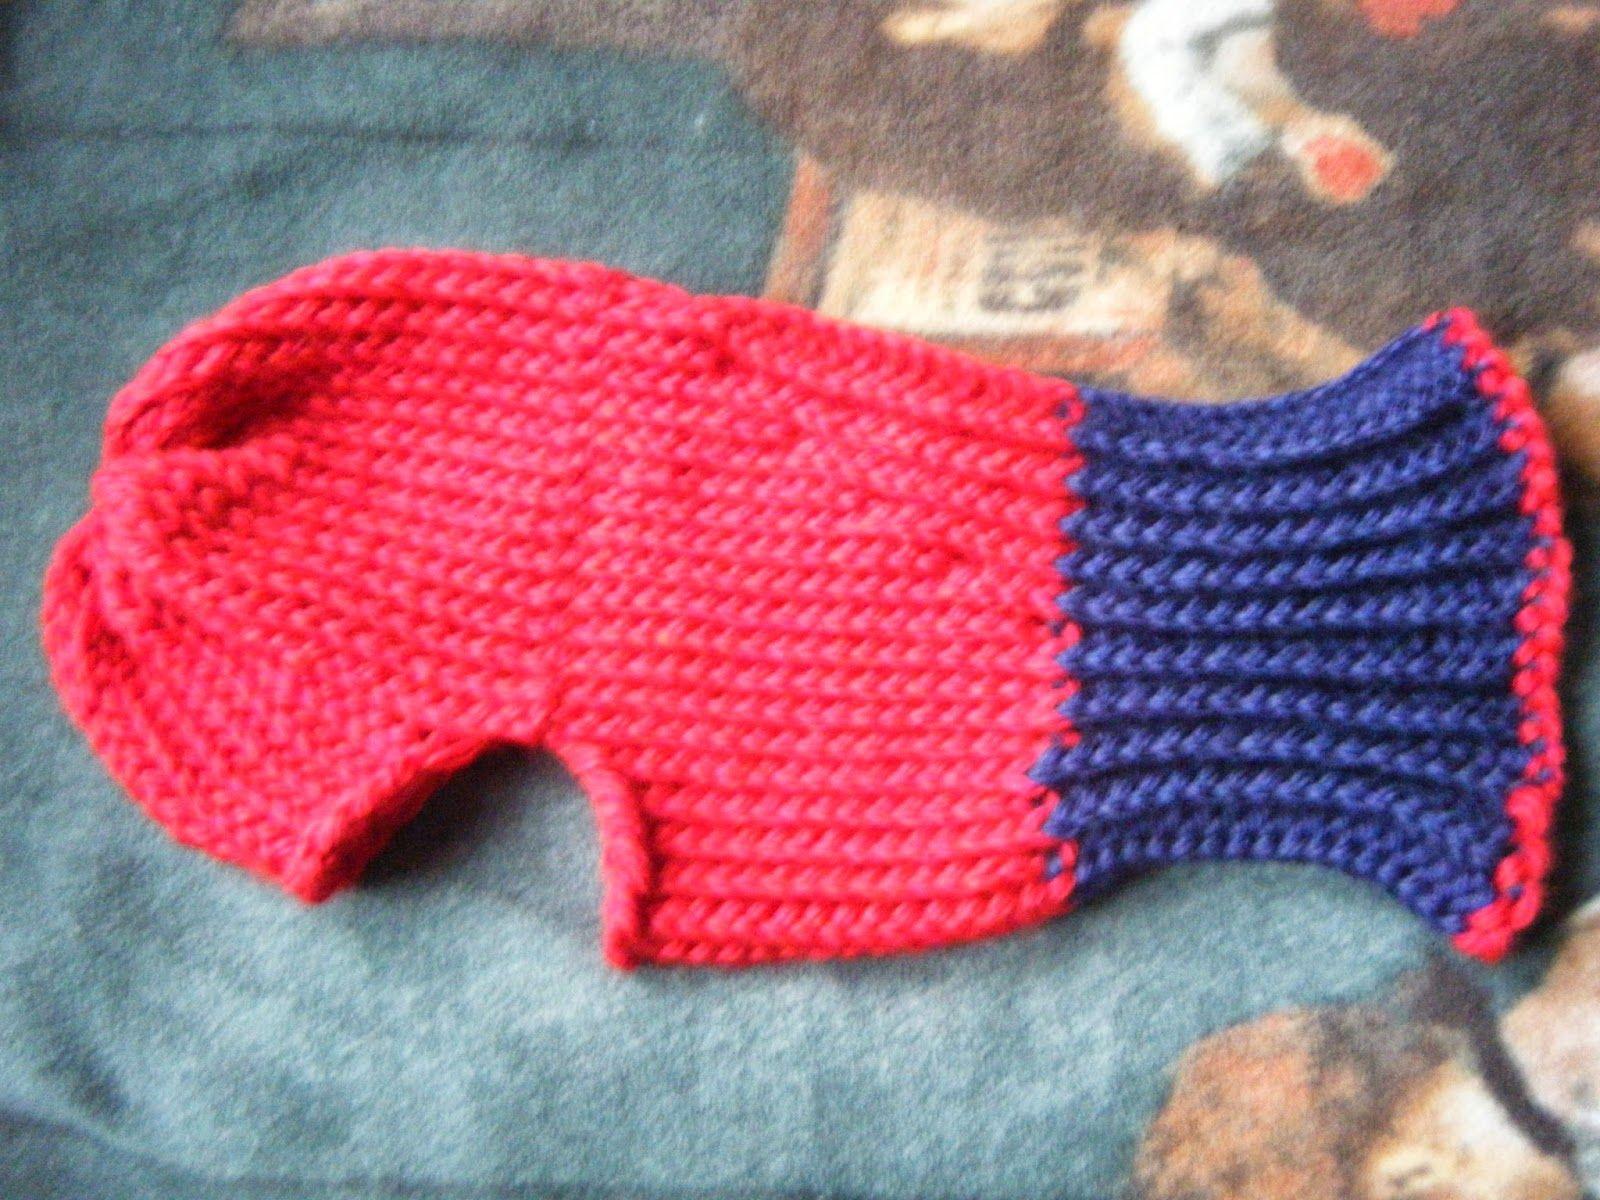 The Loom Muse Creations and Ideas: Ski Mask | Loom Knitting | Pinterest